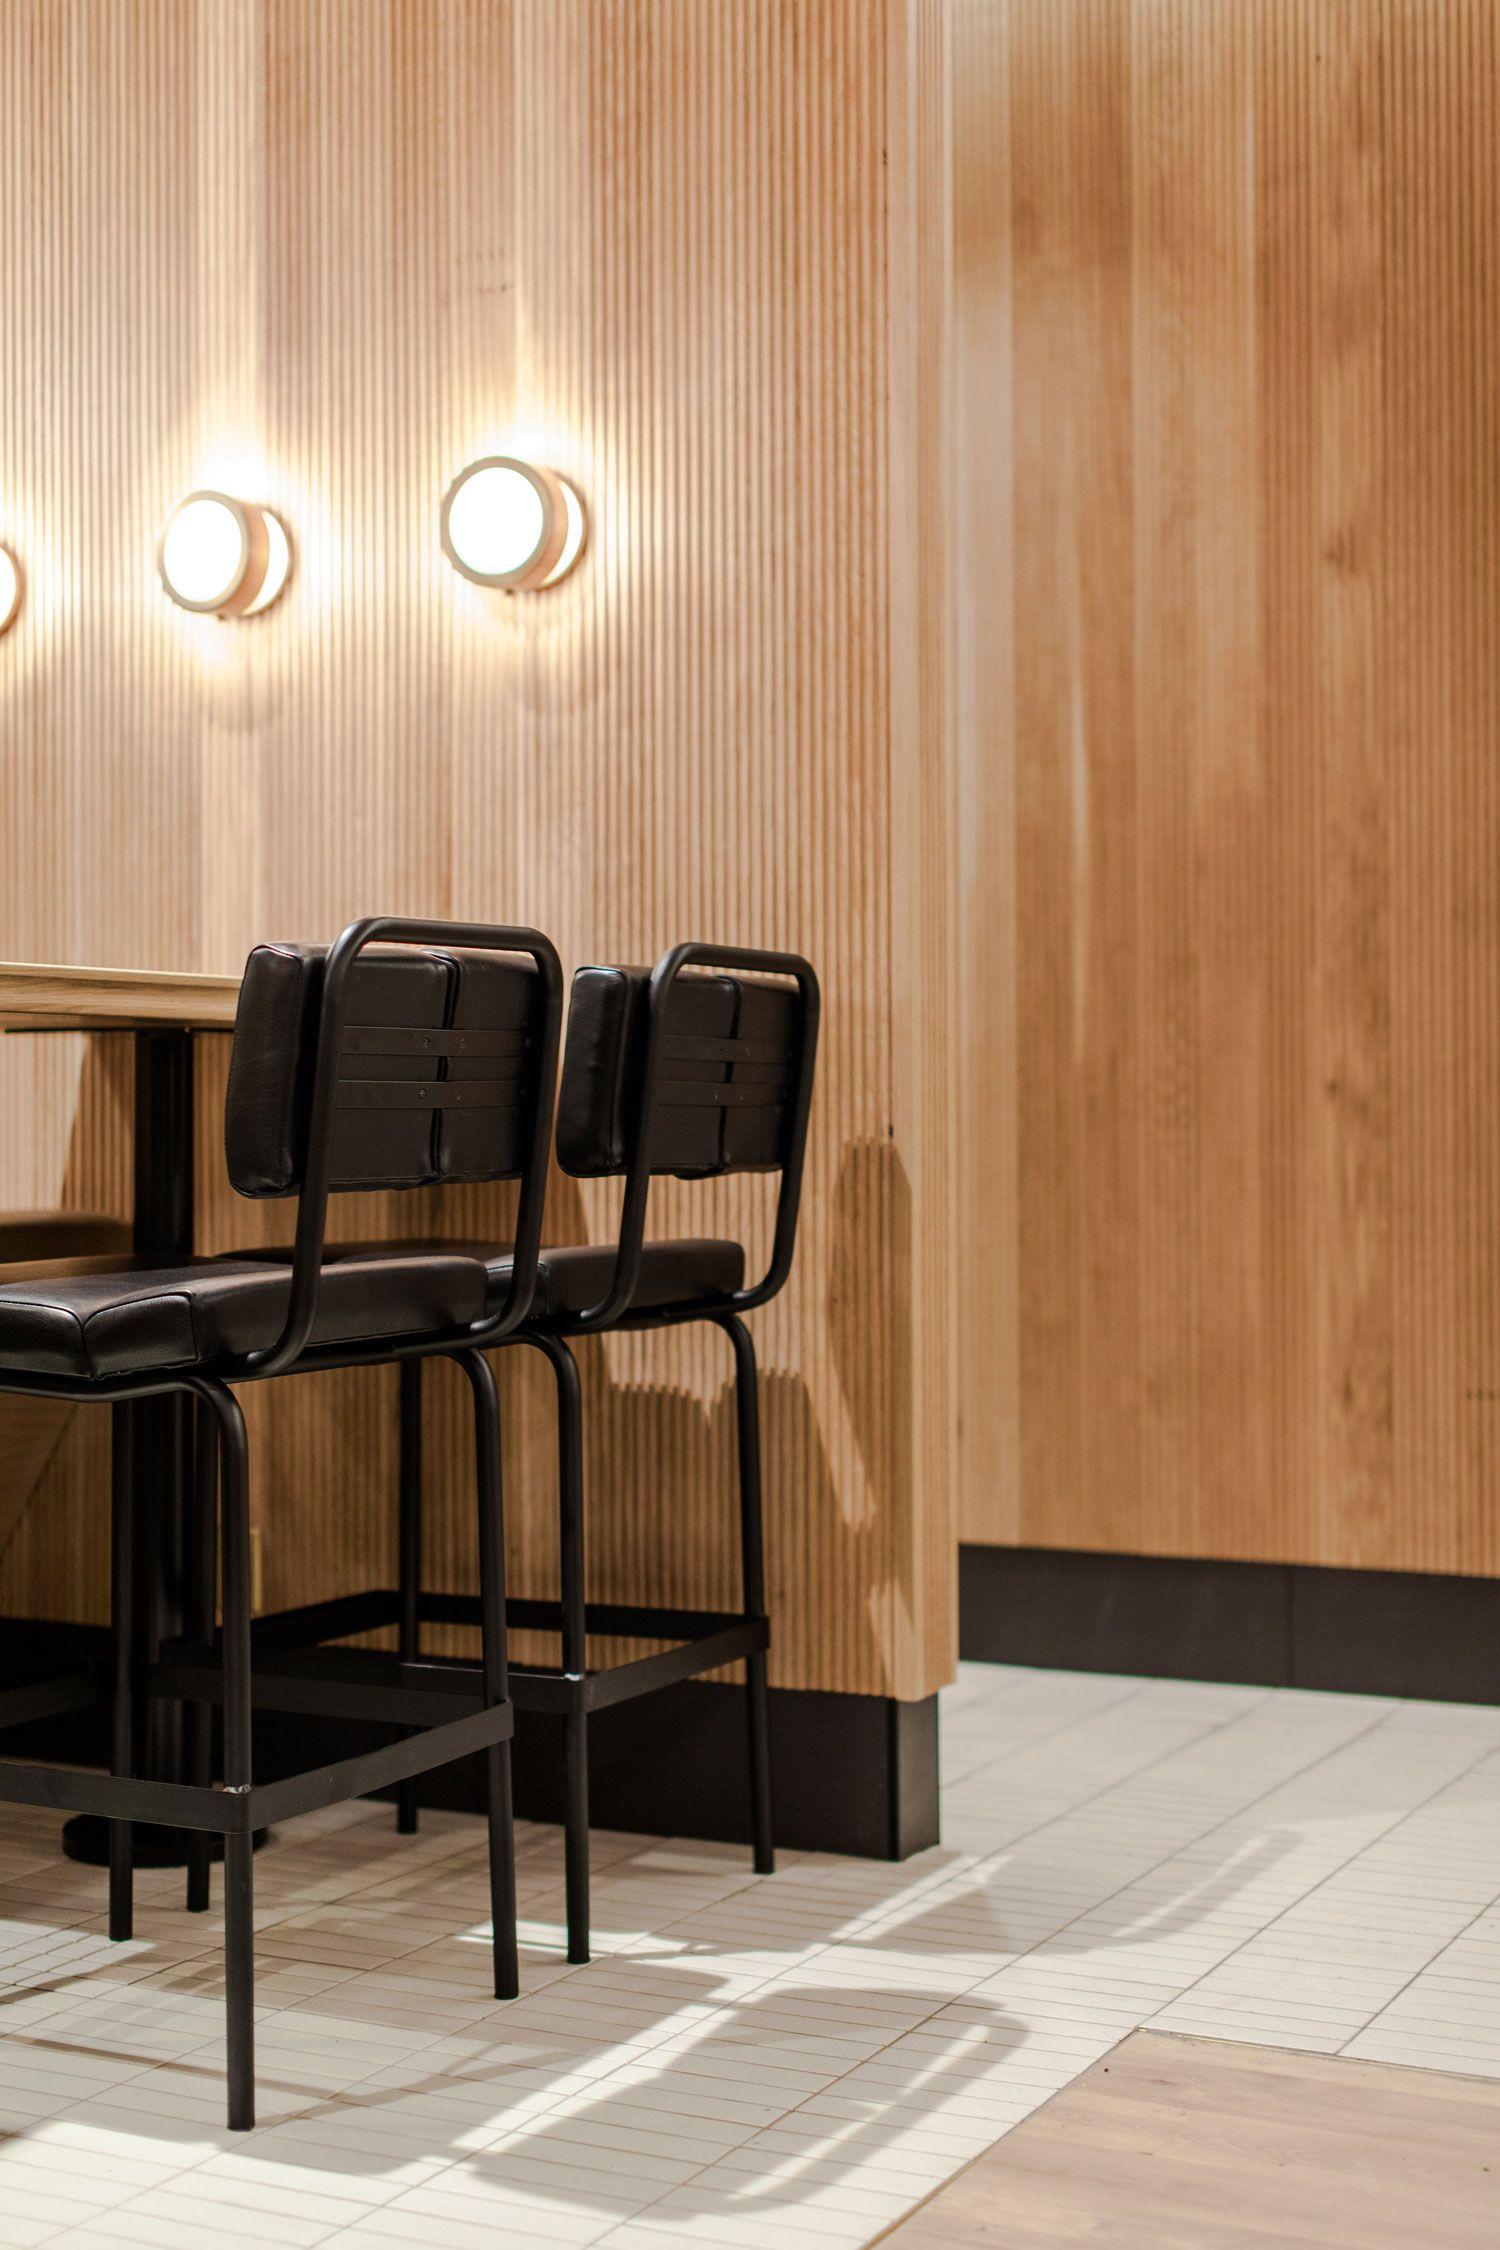 Earls 67 Concept Restaurant In Calgary By Ste Marie Cafe InteriorsRestaurant DesignRestaurants